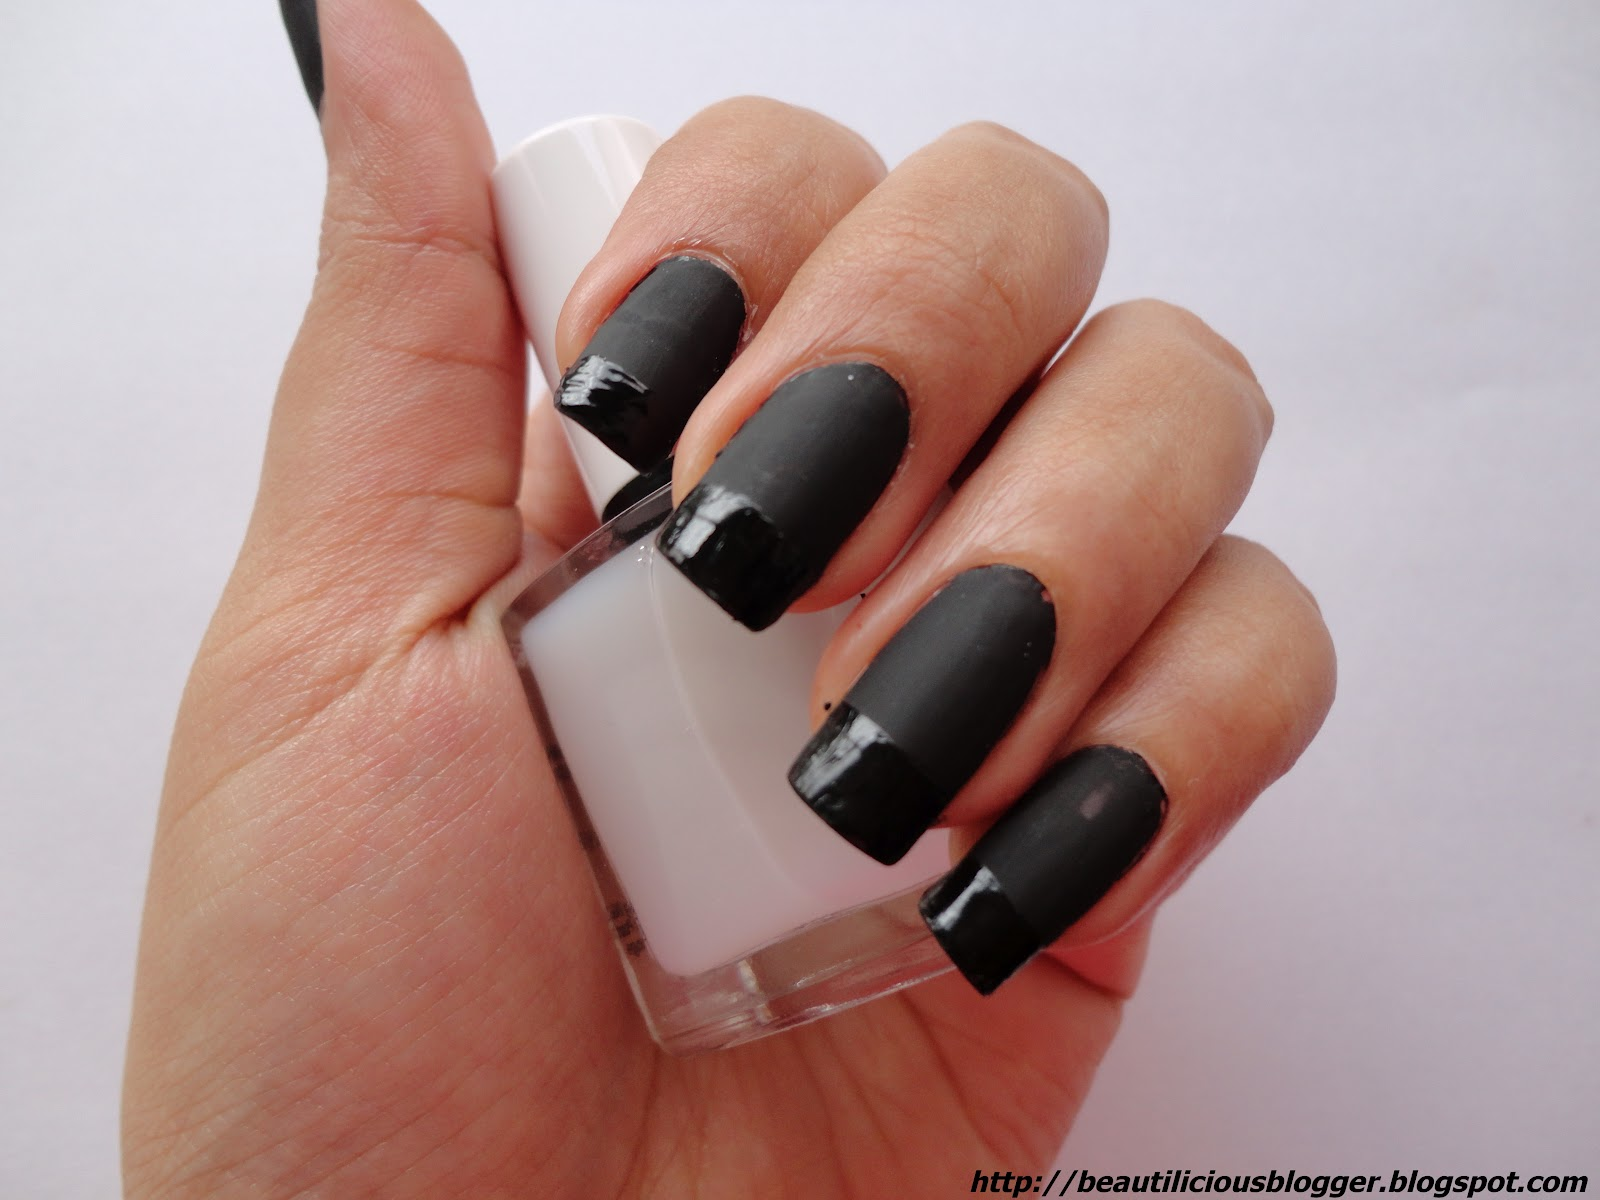 Acrylic Nail Designs Matte: Nail design chic matte dark floral ...